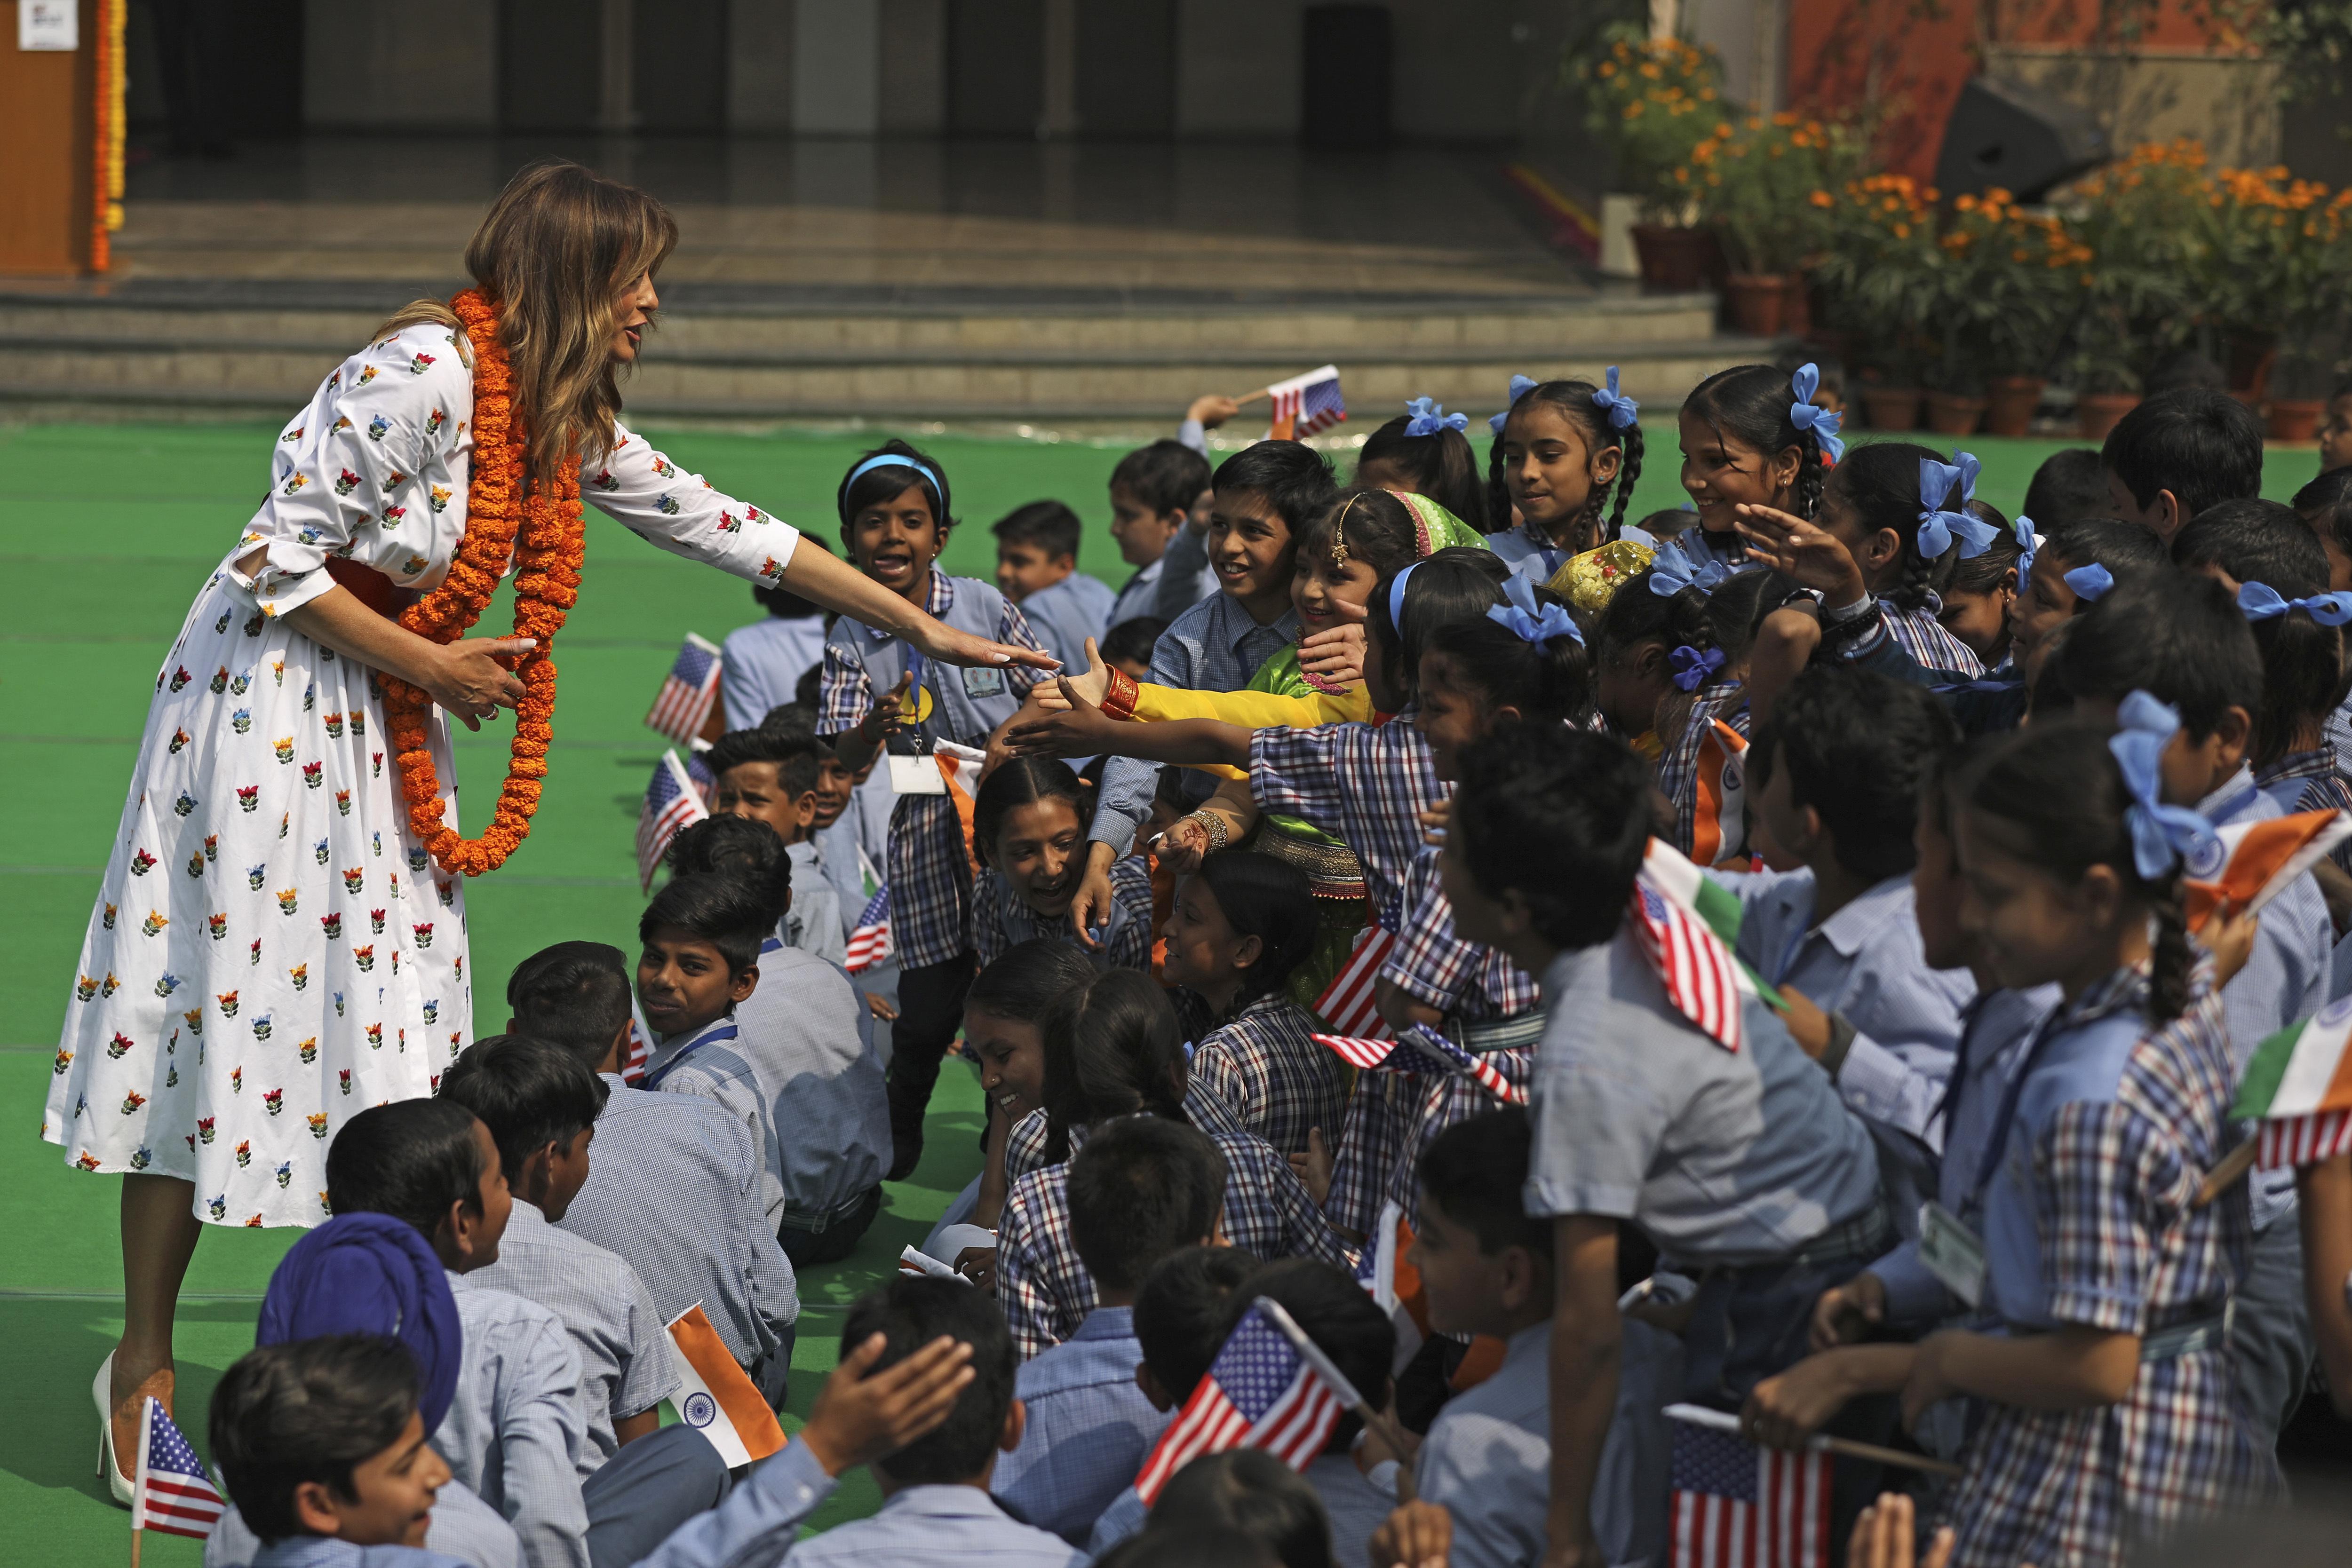 U.S. first lady Melania Trump shakes hand with children at Sarvodaya Co-Educational Senior Secondary School in New Delhi, India, on Feb. 25, 2020.